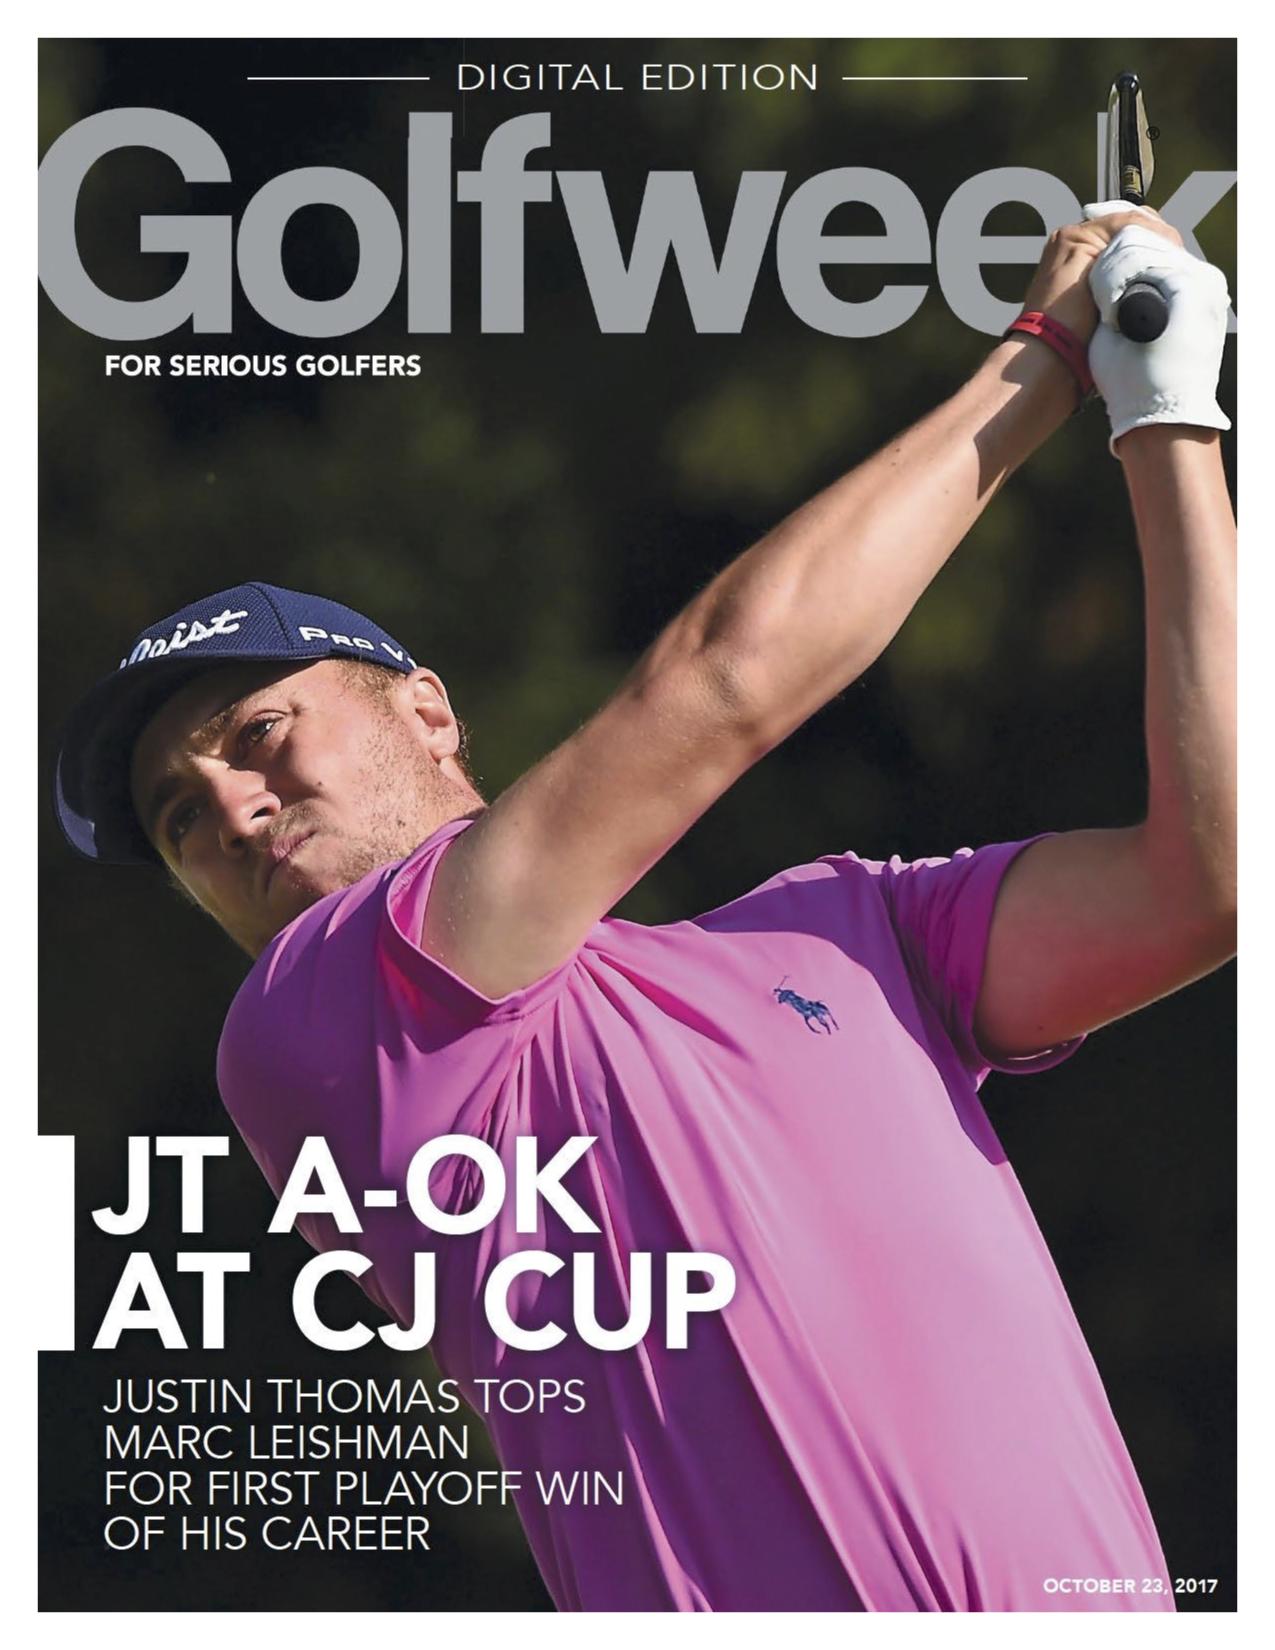 Golfweek 2 copy.jpg